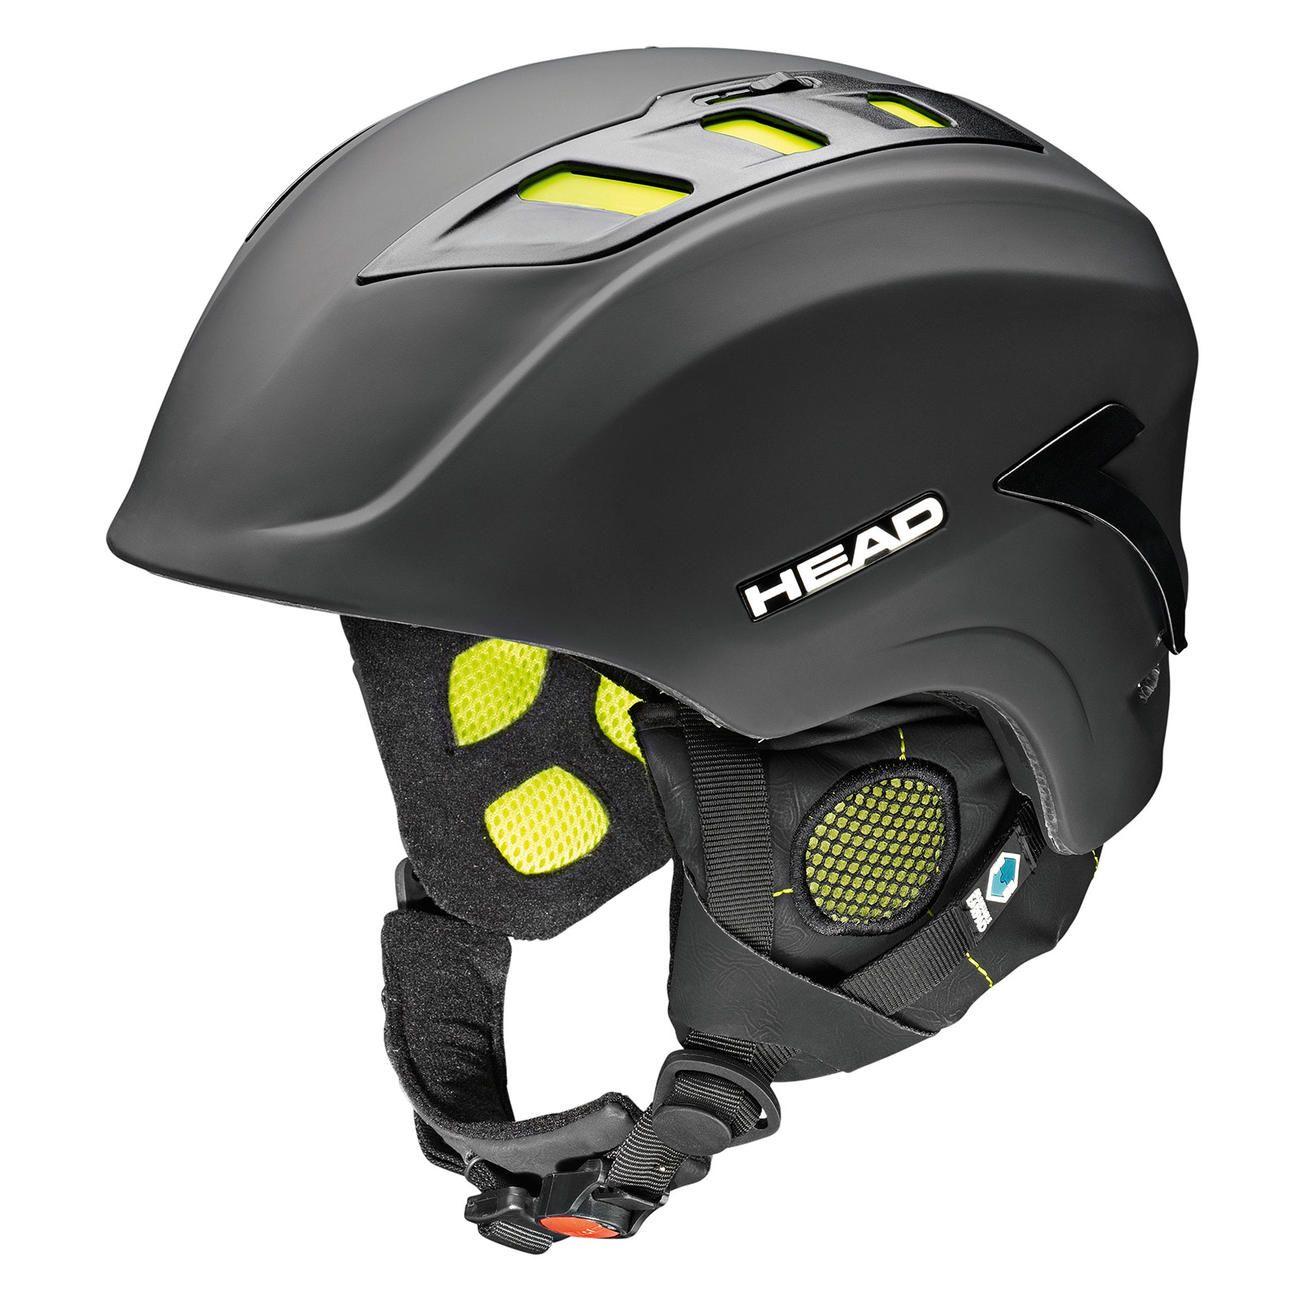 Ski Helmet Sale >> On Sale Ski Helmets Ski Helmet Up To 40 Off Ski Gear Ski